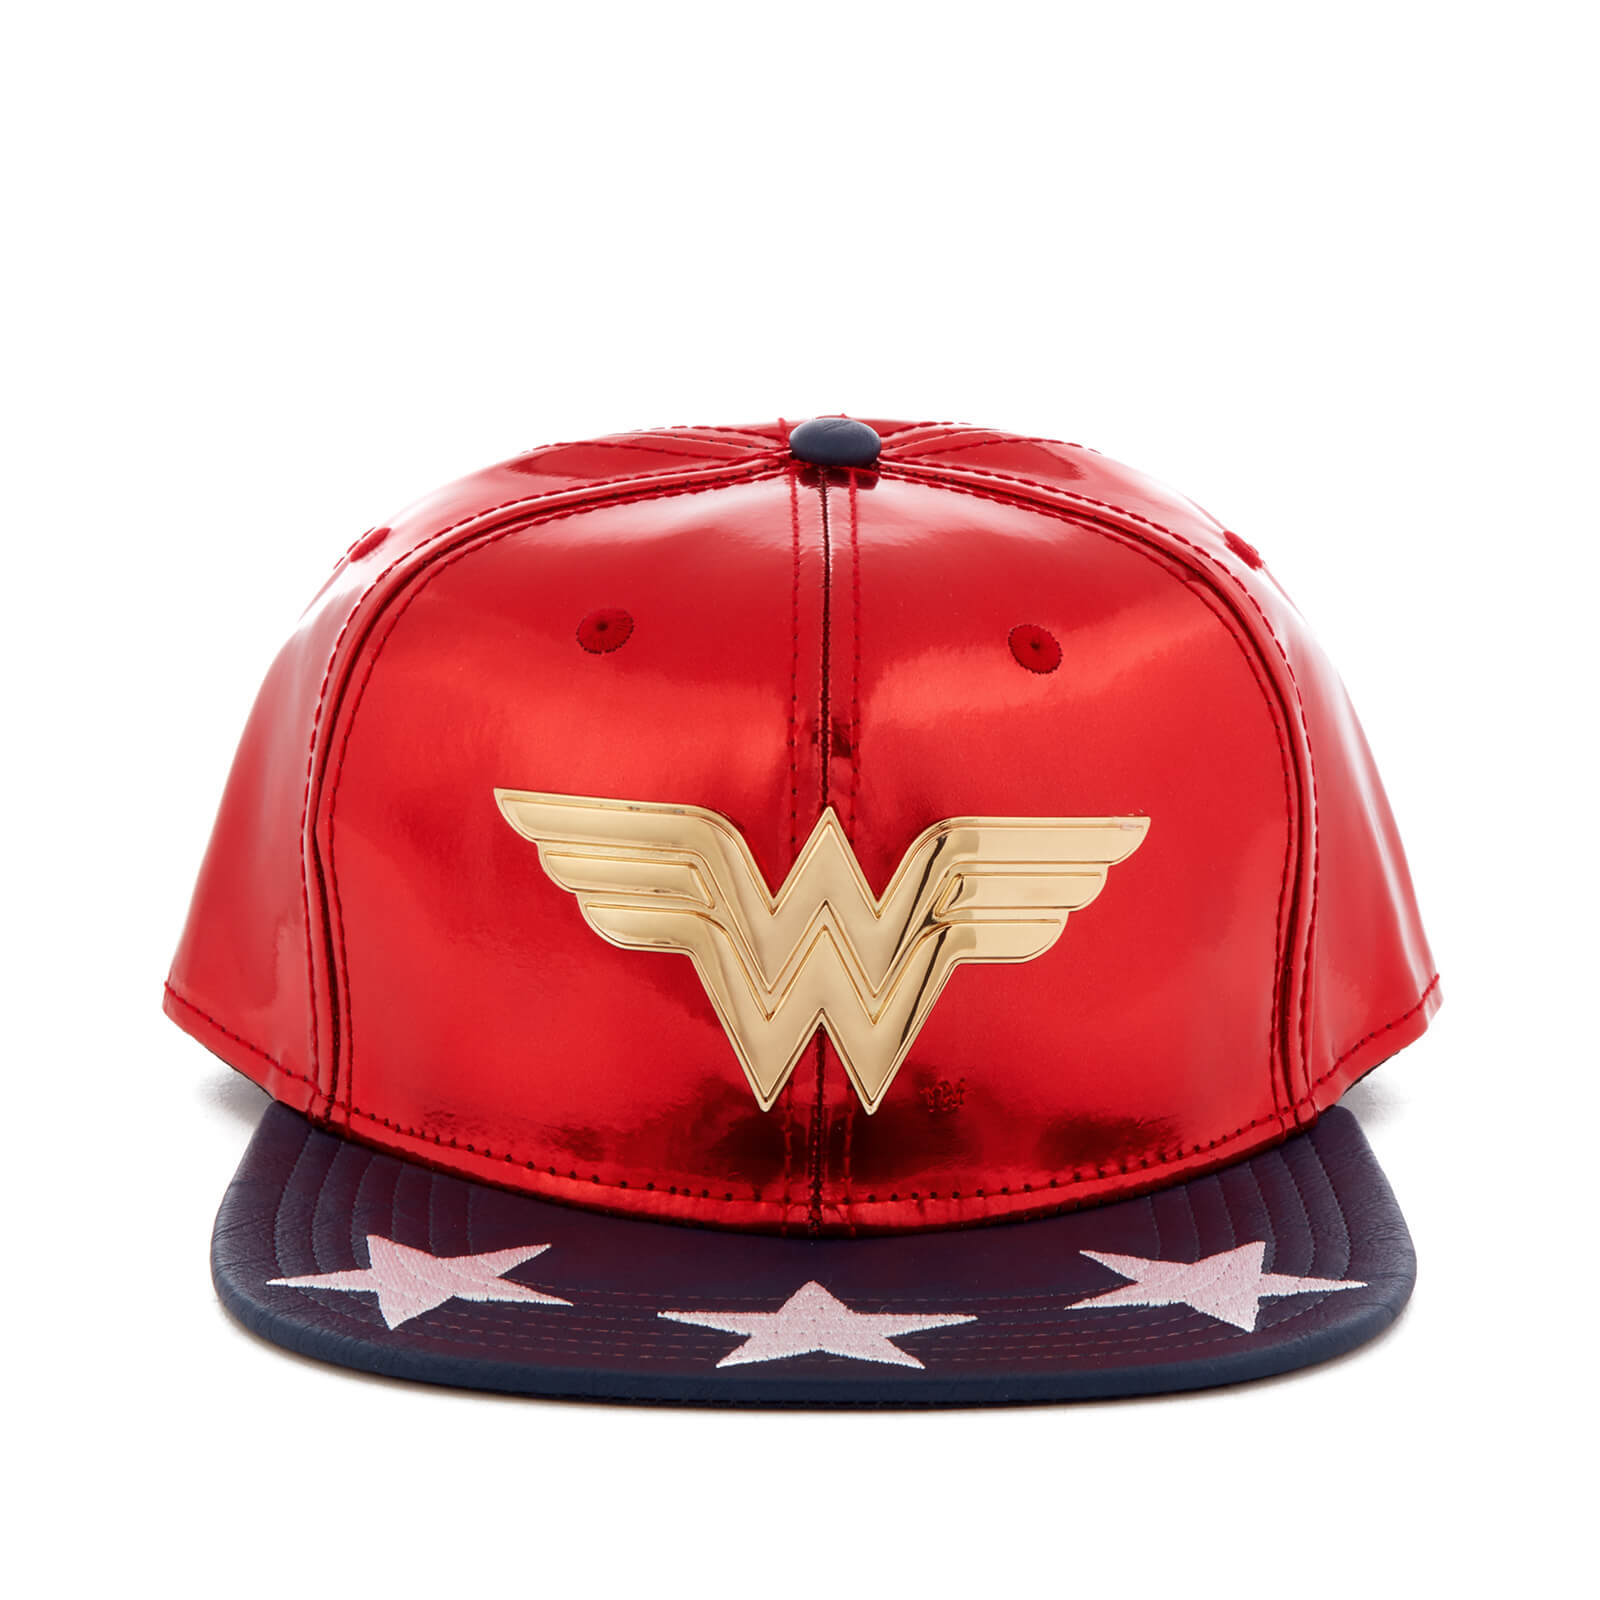 daa00e282087d9 DC Comics Wonder Woman Men's Meal Icon Snapback Cap - Red Merchandise |  Zavvi